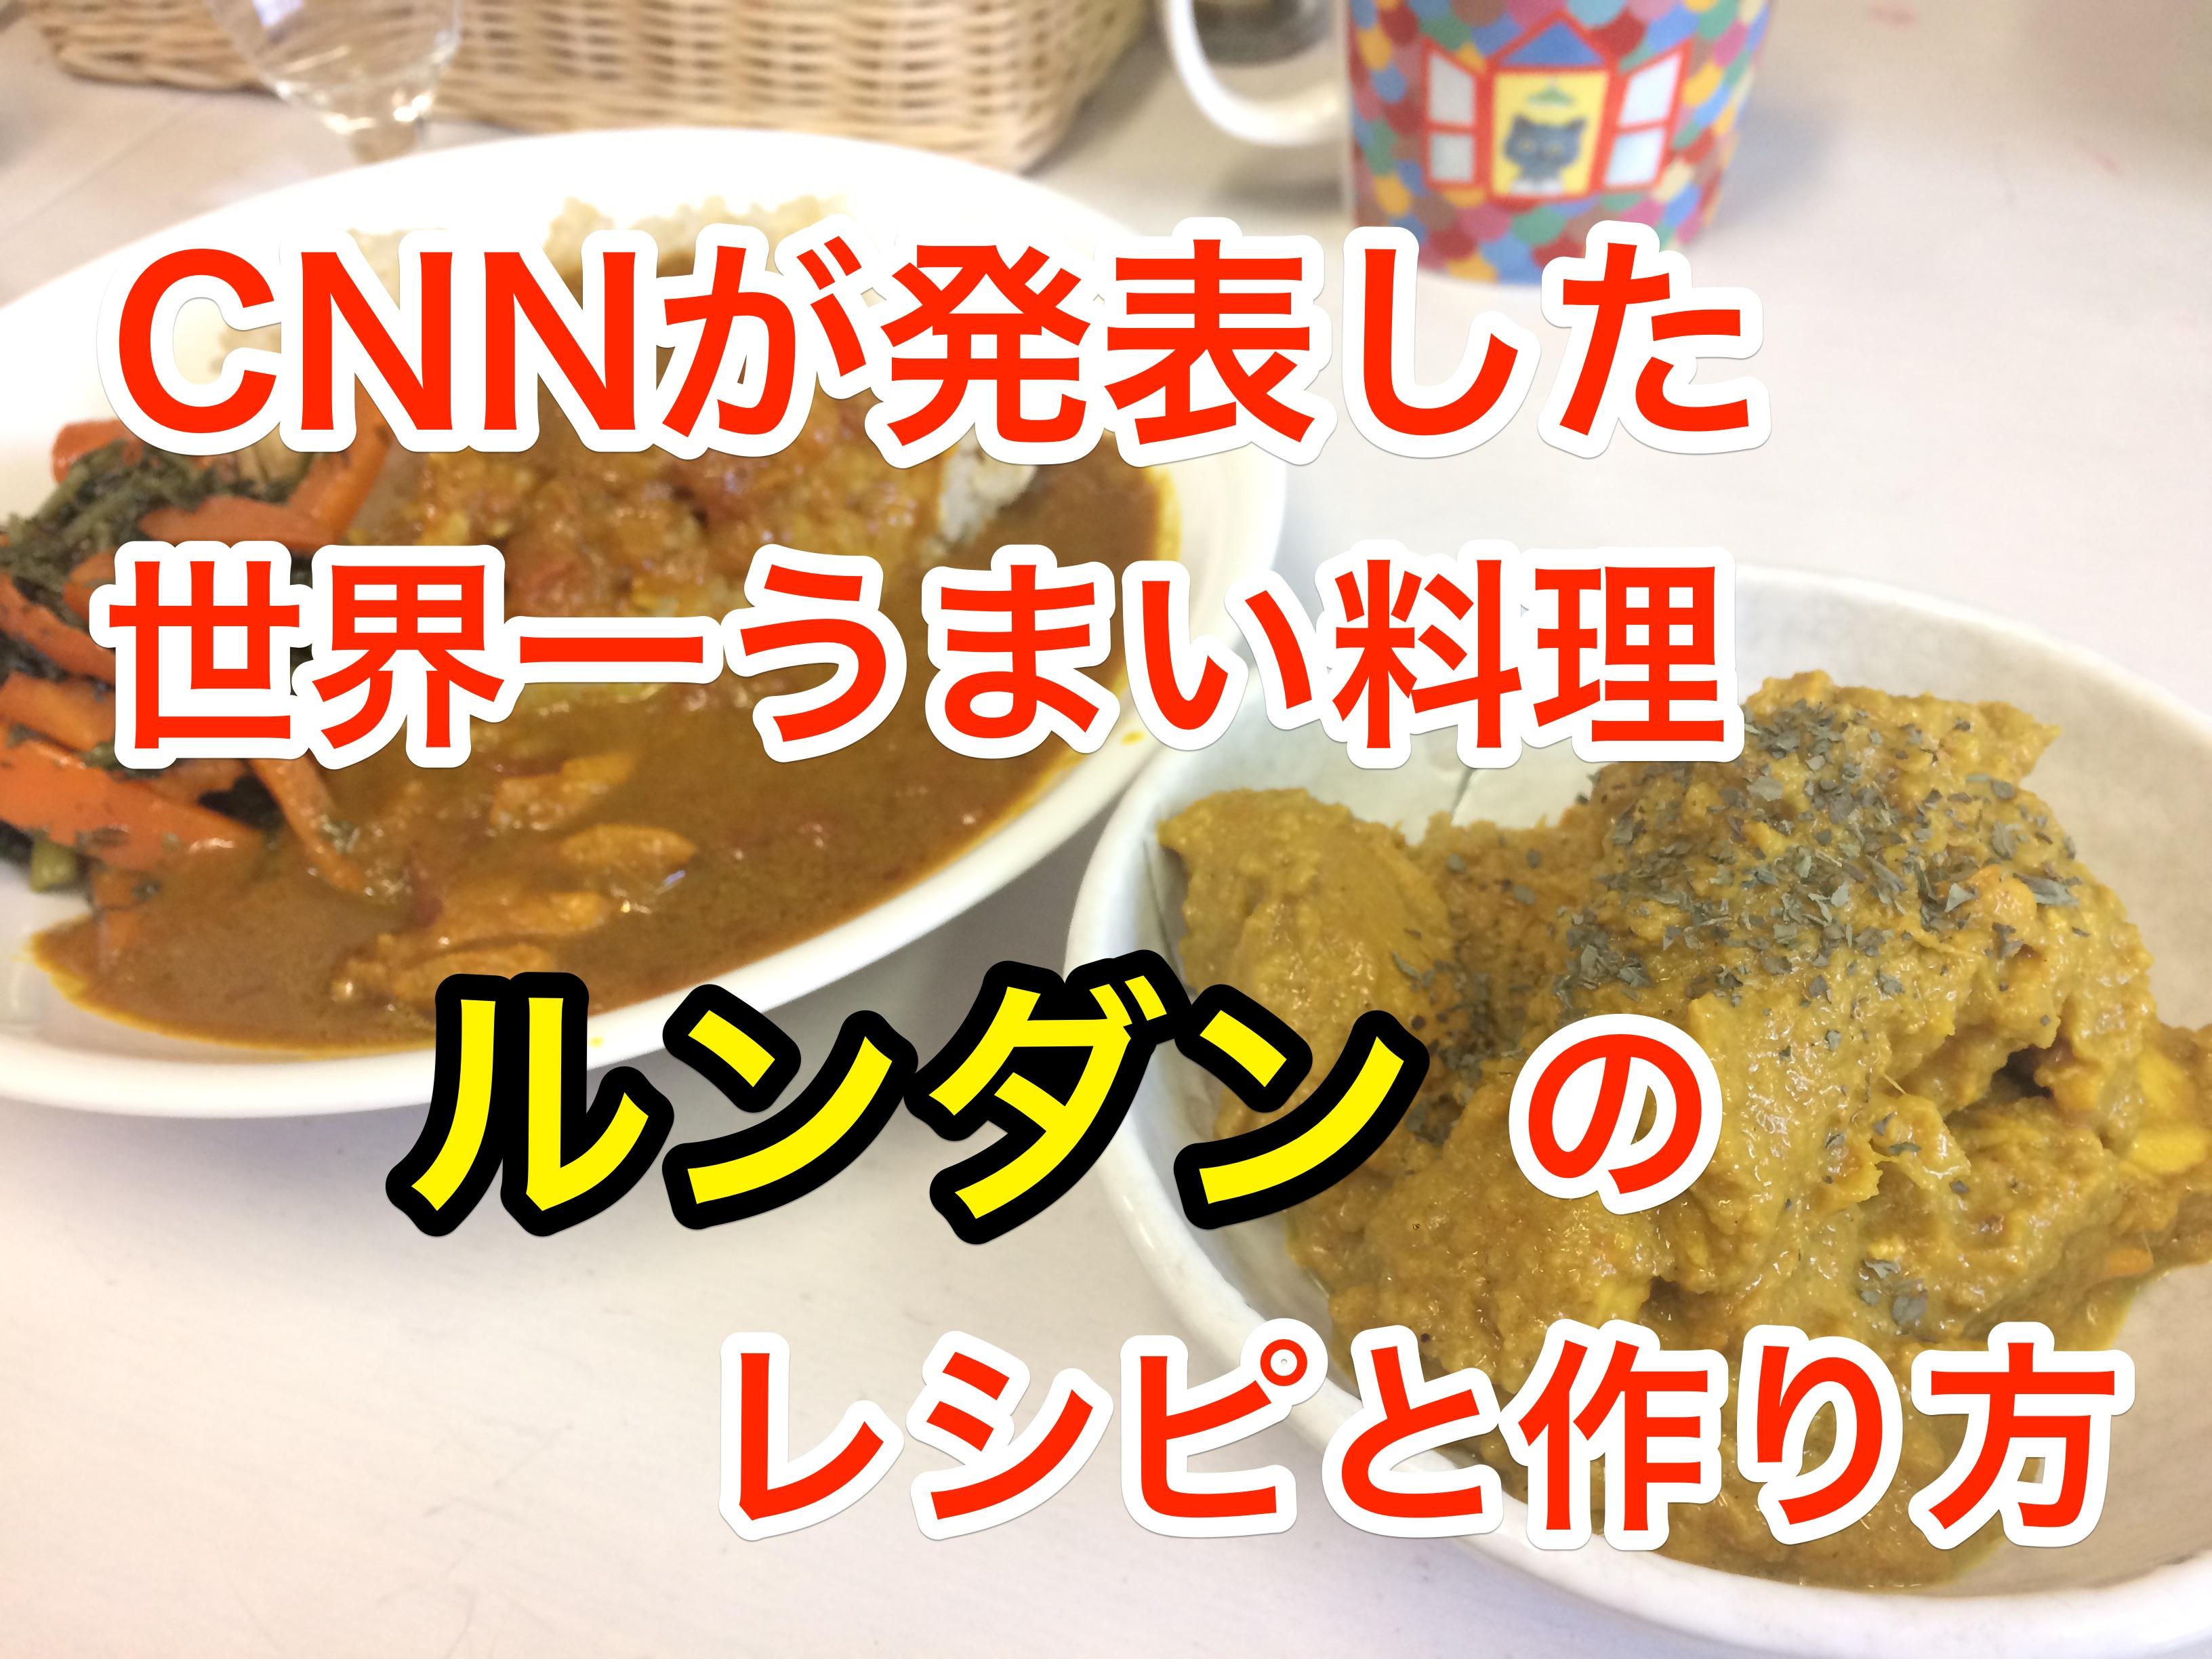 CNNが発表した世界一うまい料理「ルンダン」のレシピと作り方